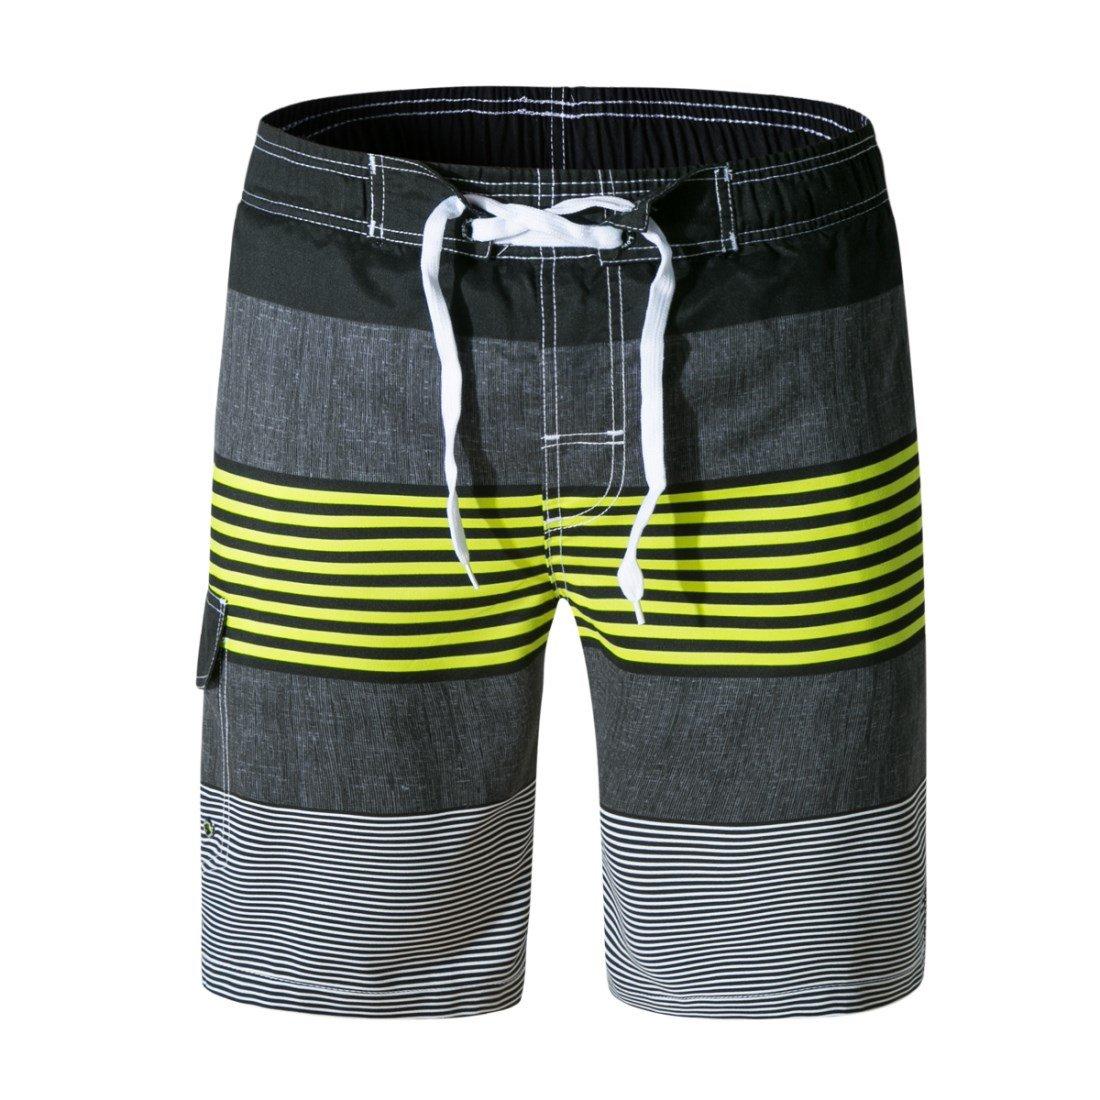 LJCCQ Men\'s Swim Trunks Quick Dry Stripe Board Shorts with Pockets Swim Shorts Beachwear with Drawstring